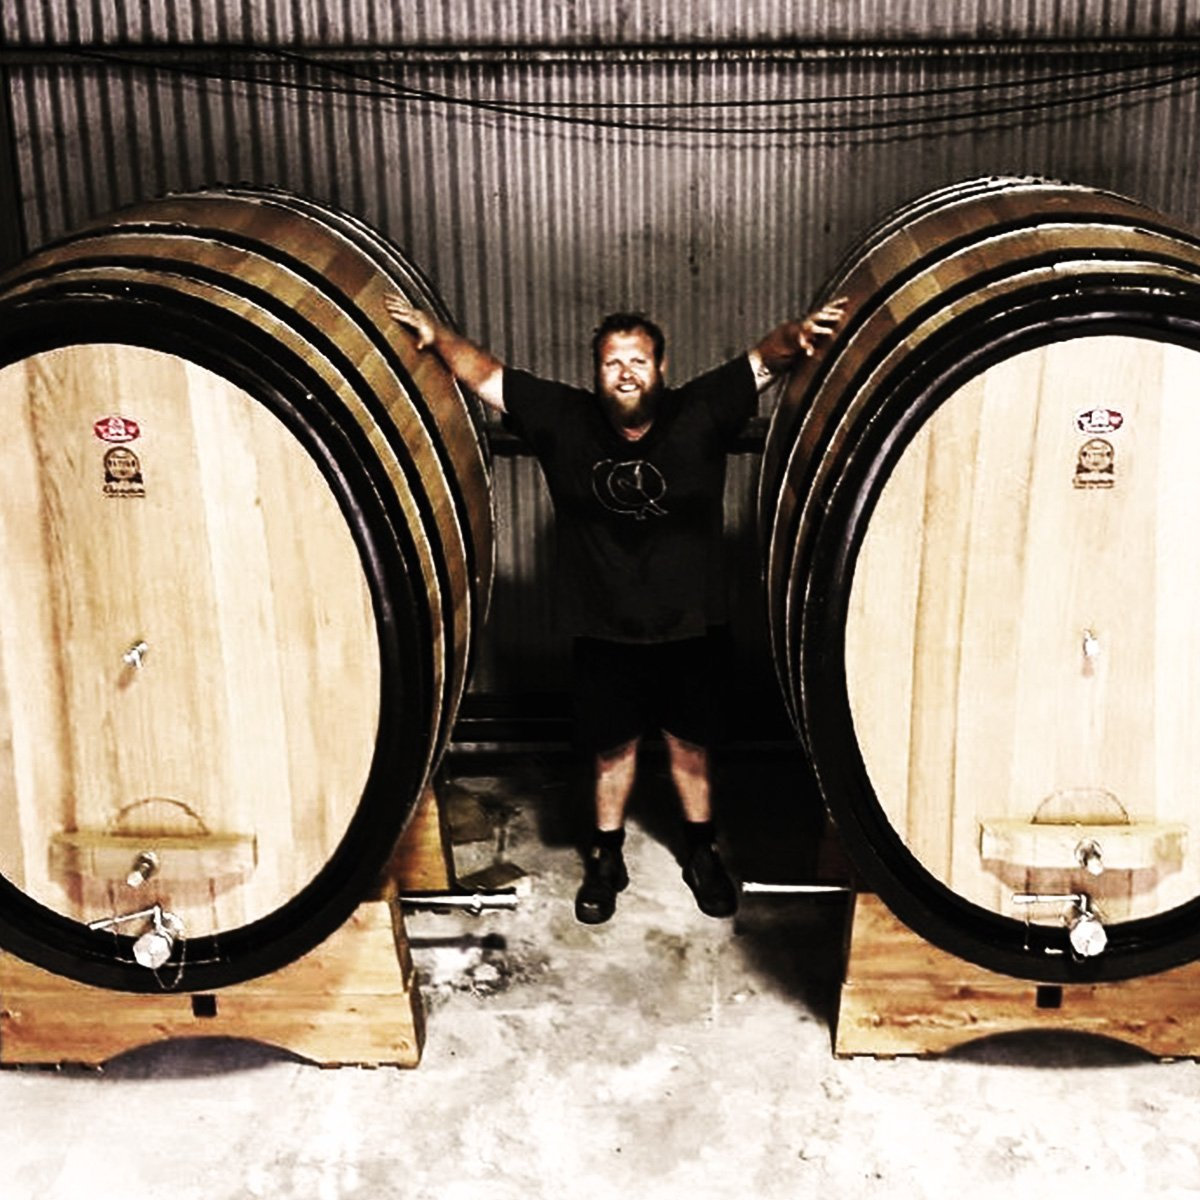 Vanguardist Wines